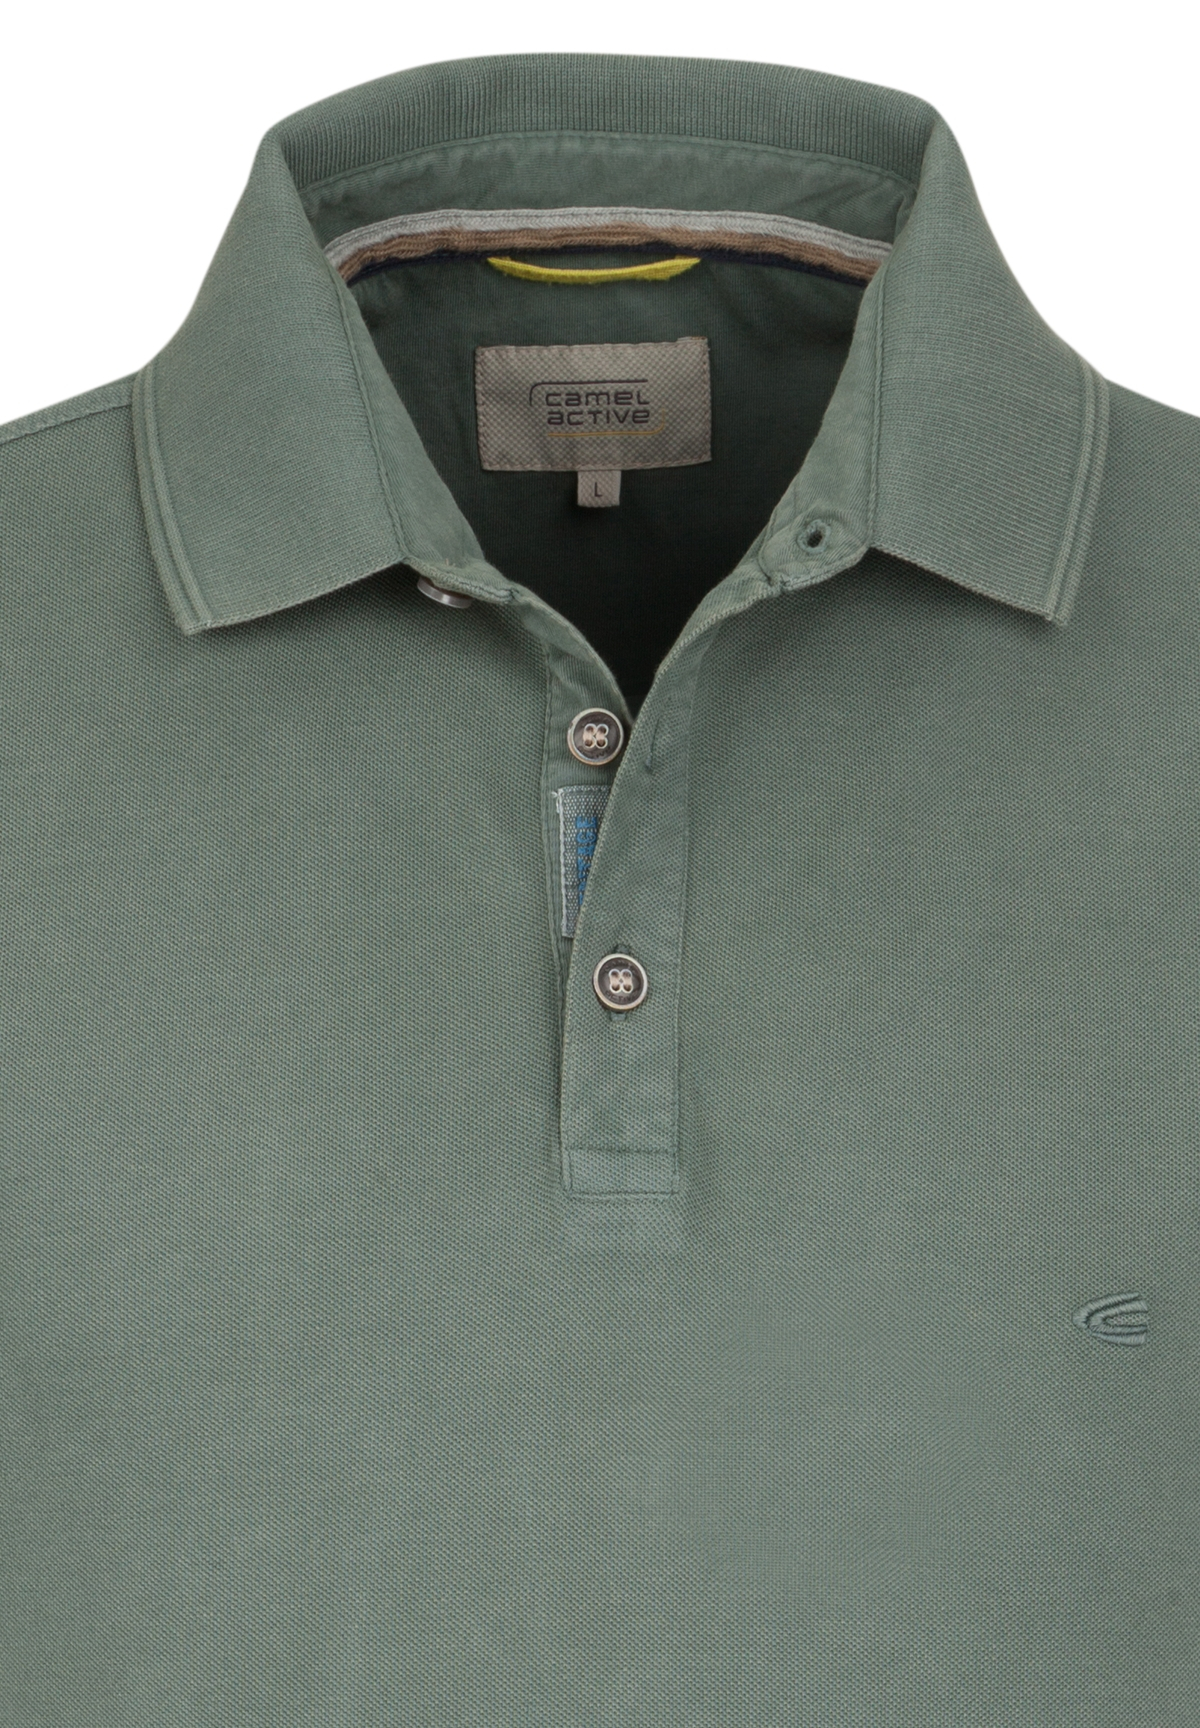 Camel-Active-Herren-Shirt-Poloshirt-Pique-Regular-Fit-NEU Indexbild 85